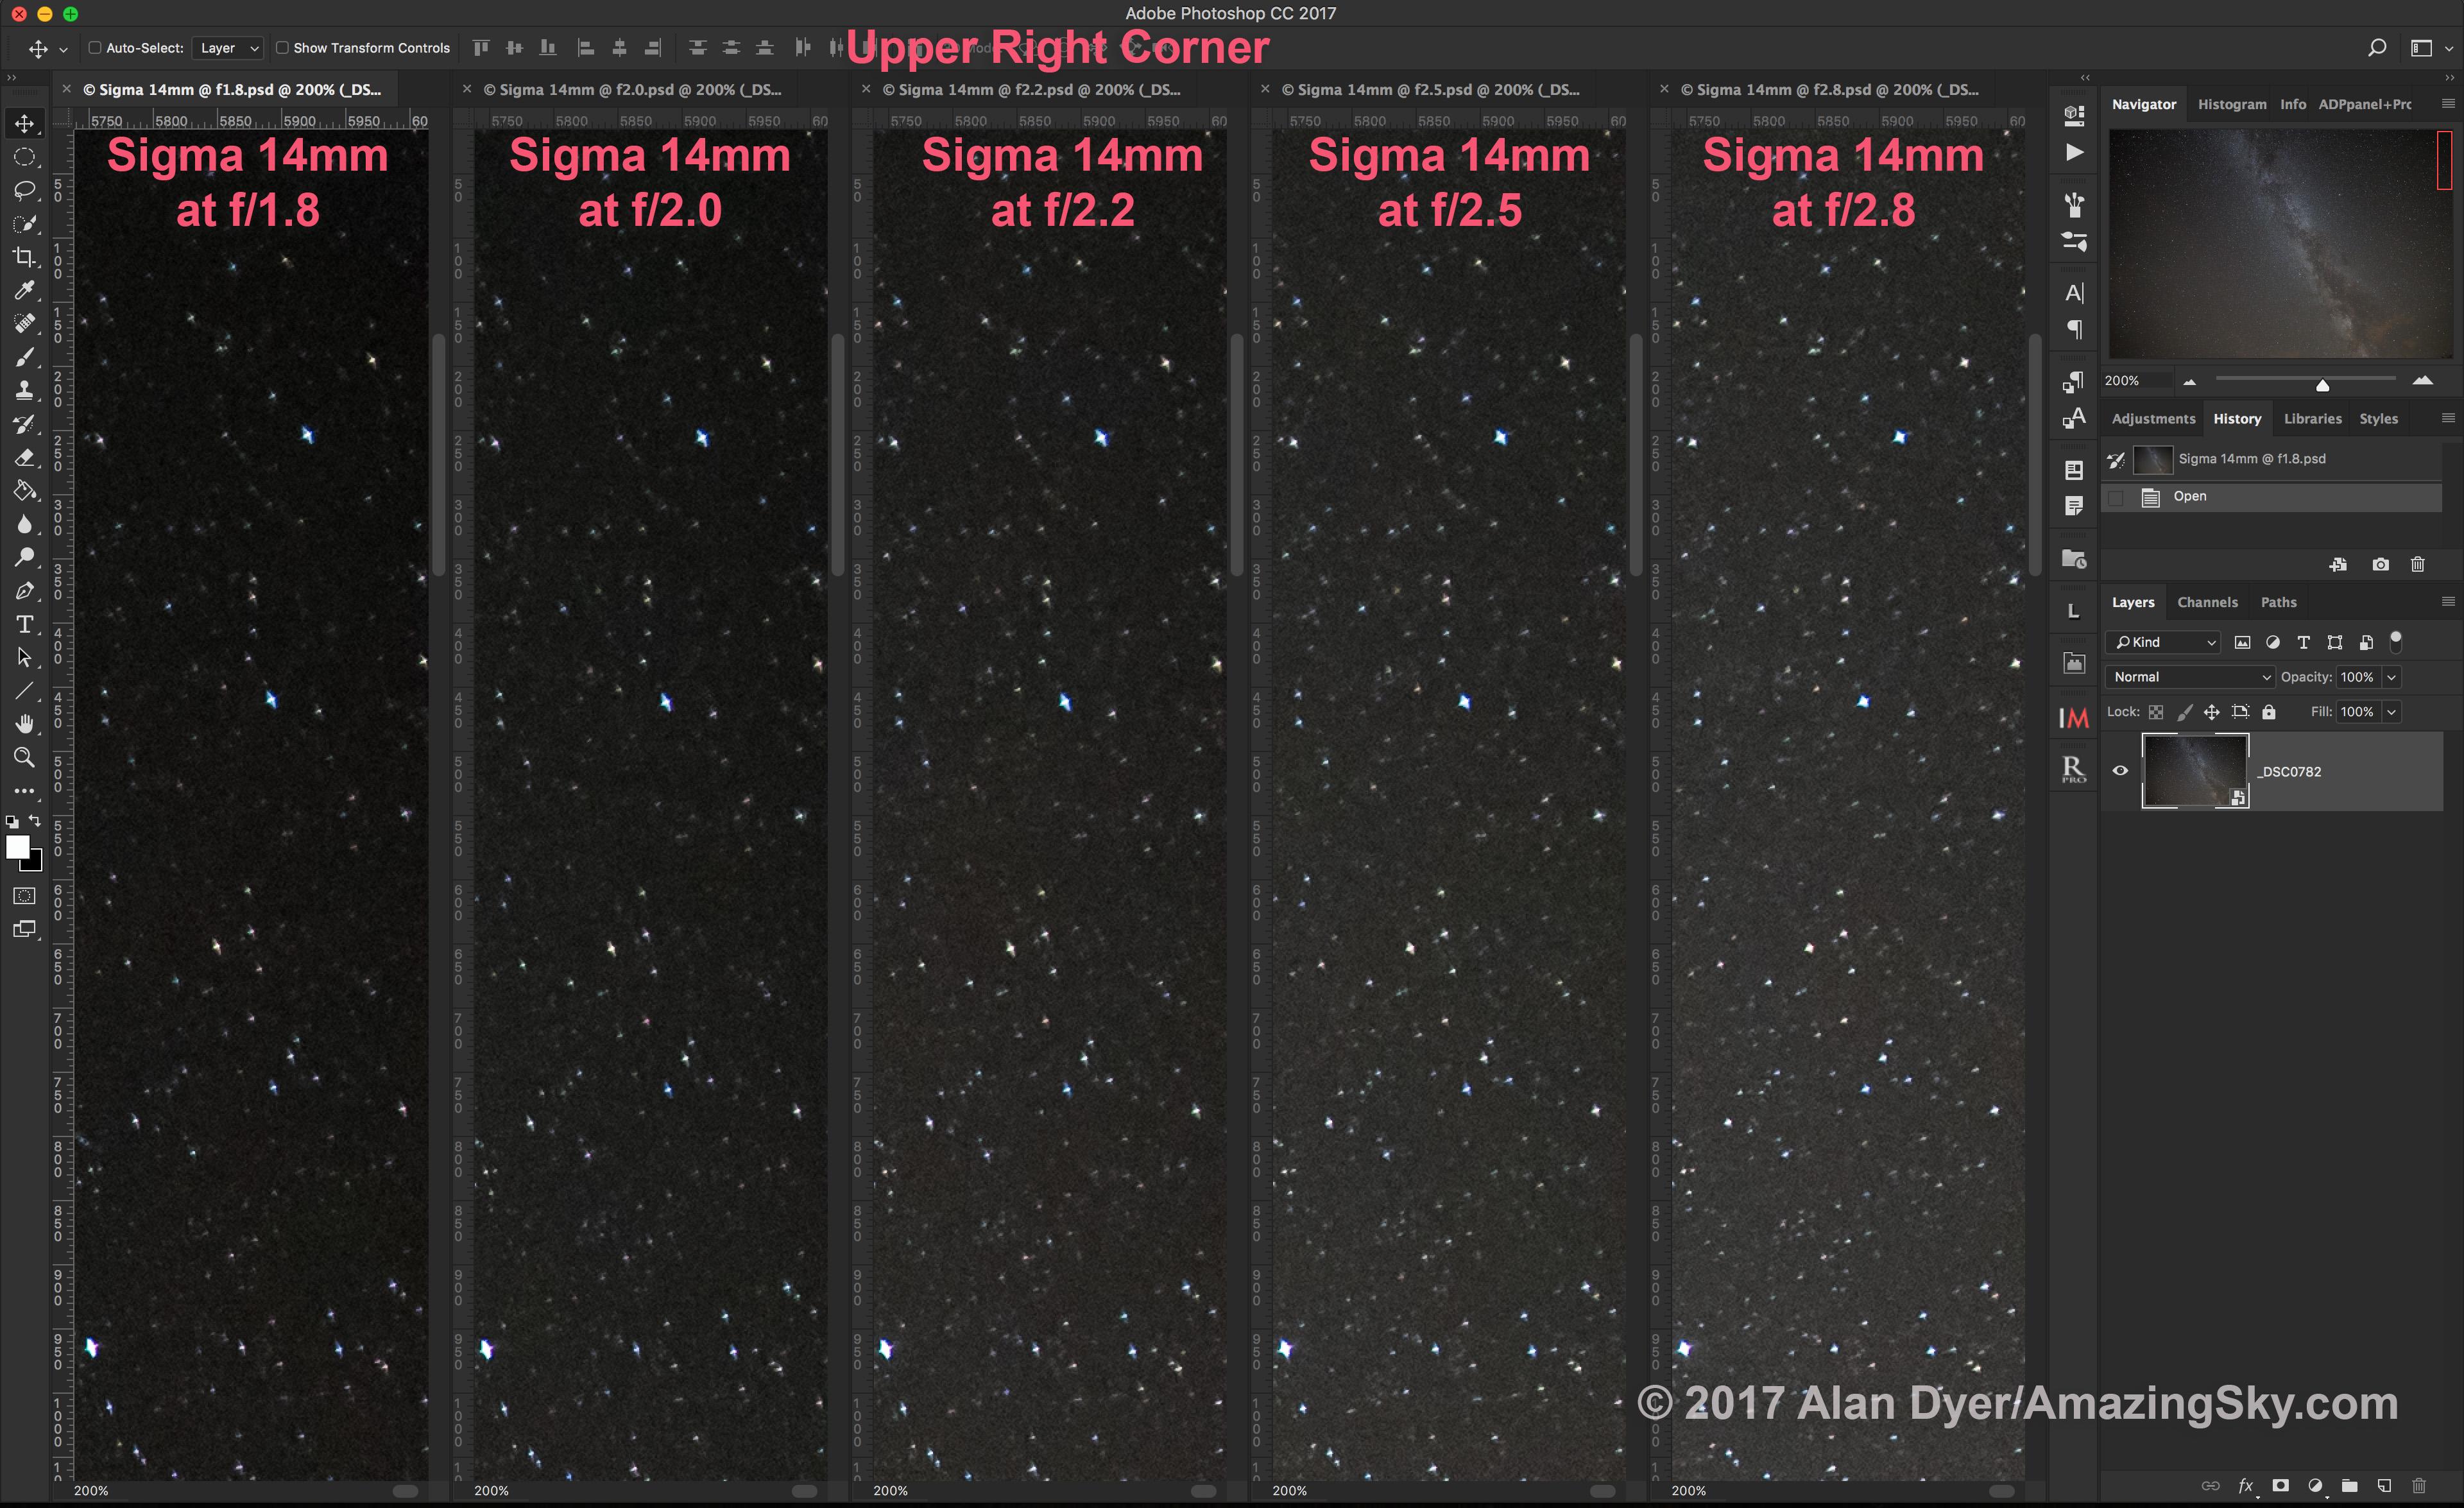 Sigma 14mm Upper R Corner